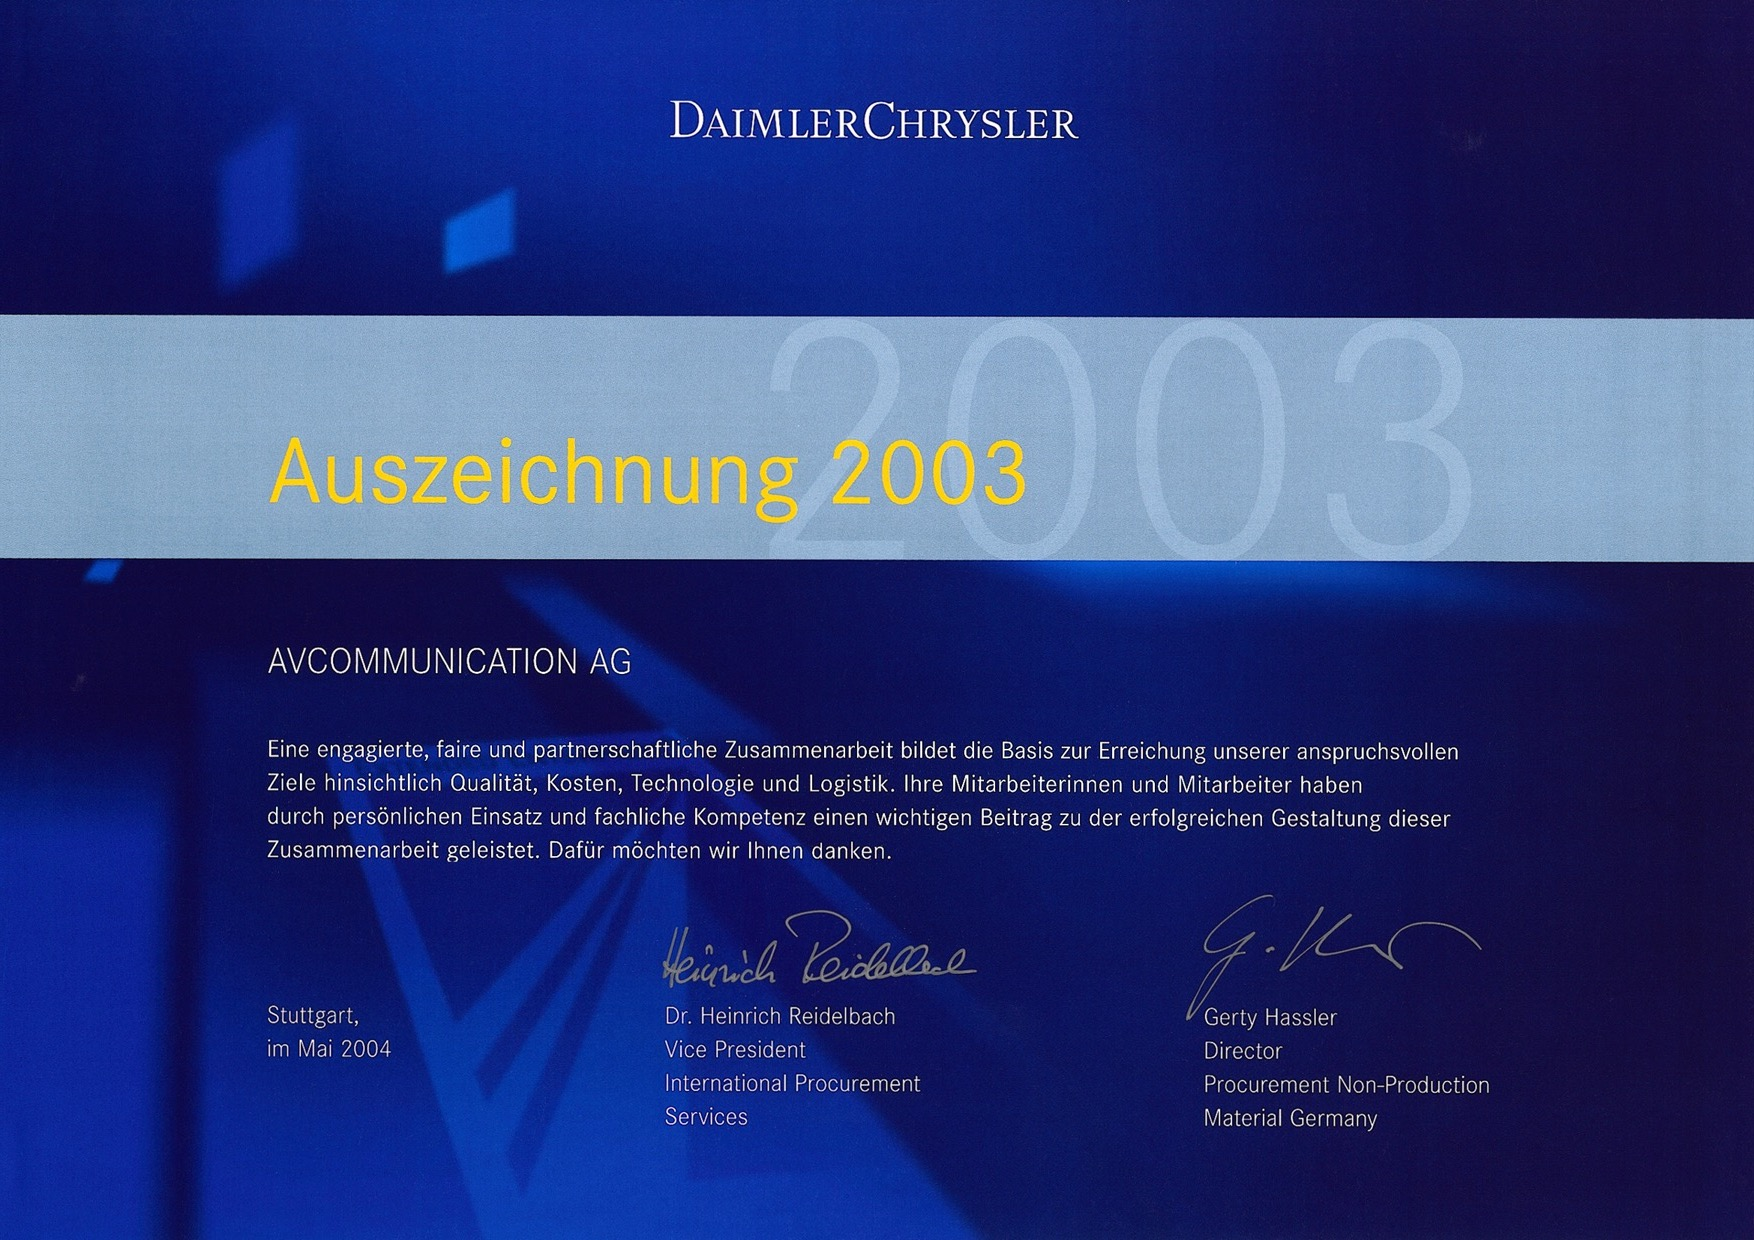 DaimlerChrysler_premium supplier award_2003.jpg